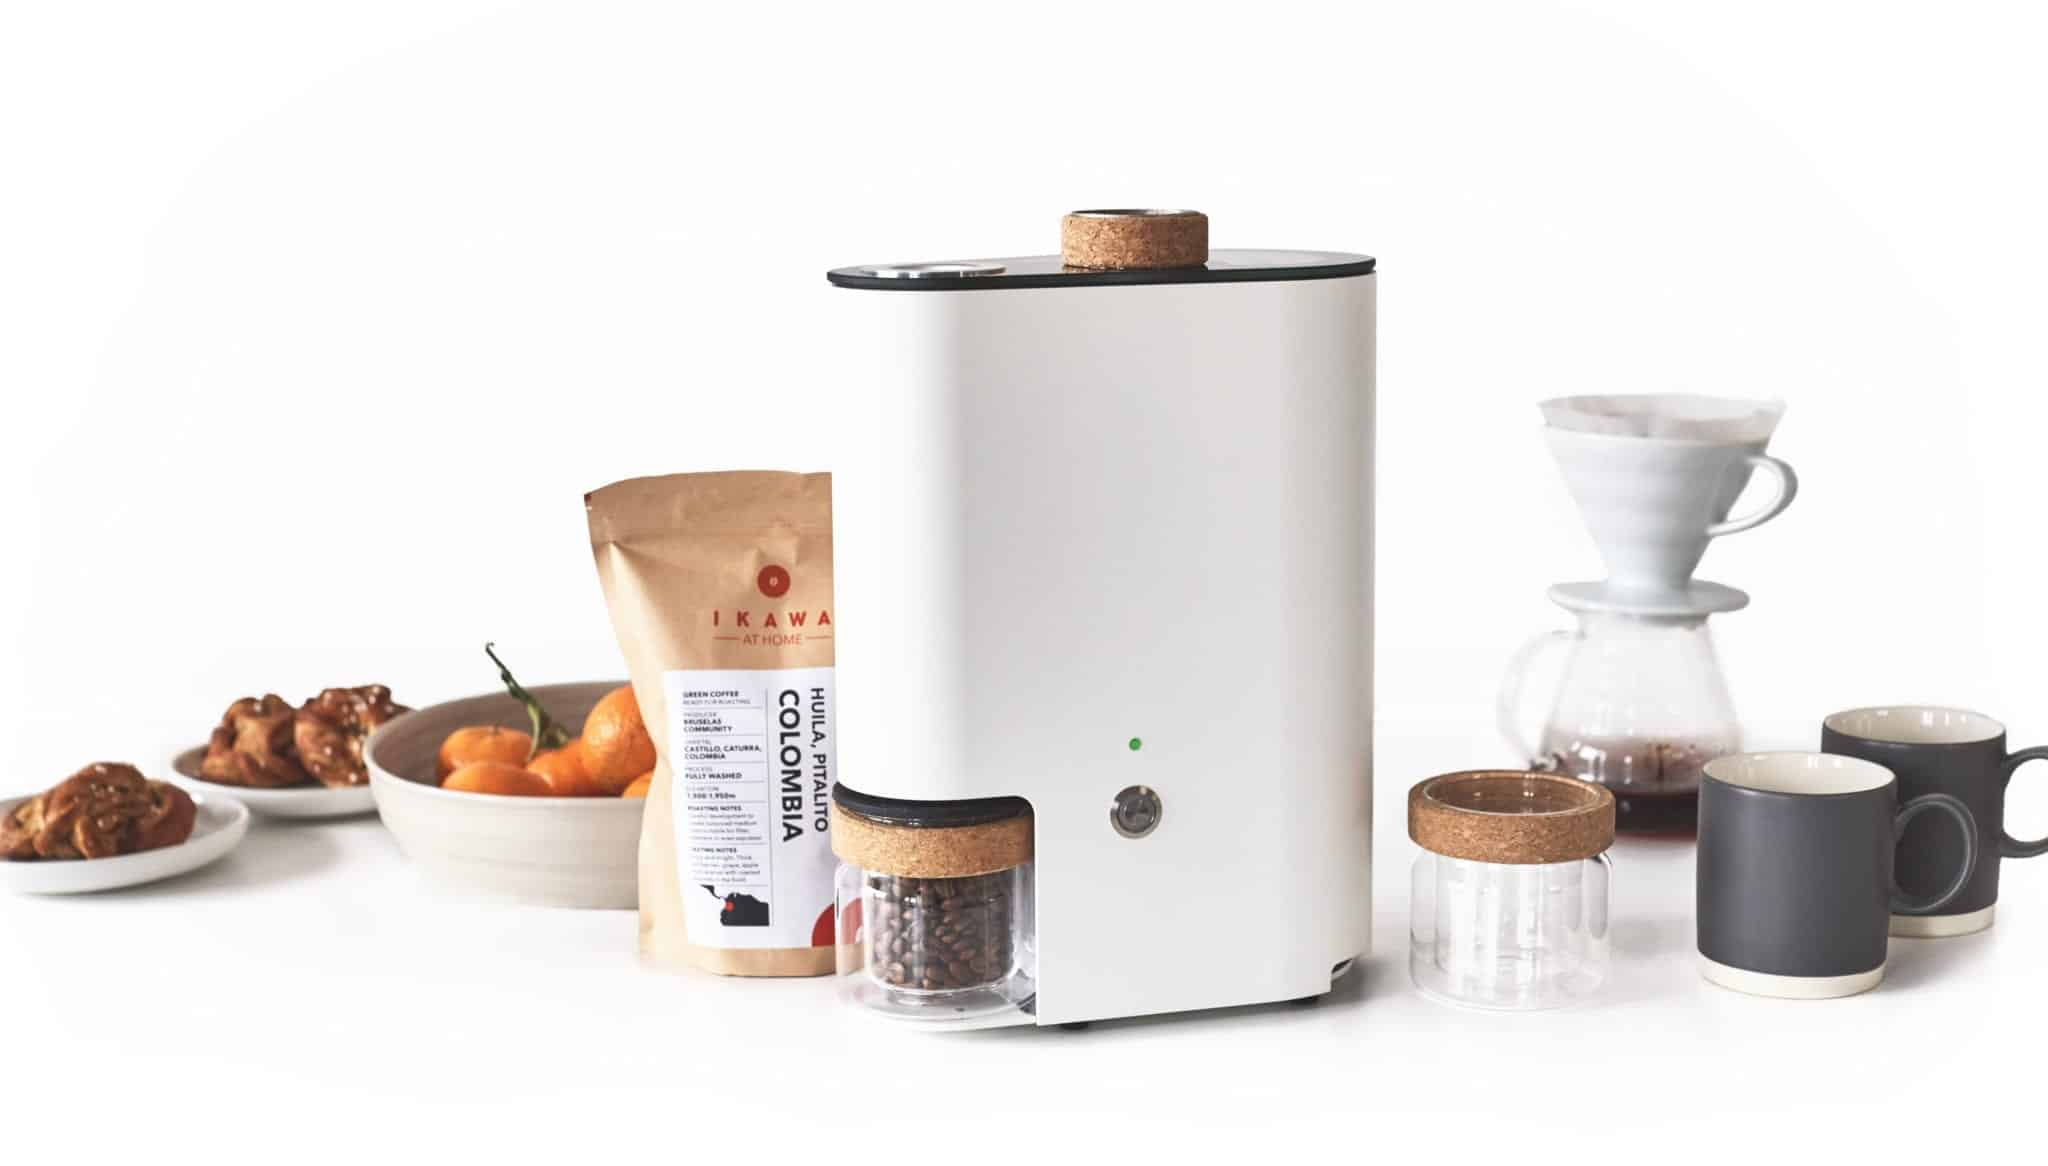 IKAWA Home Smart Coffee Roaster System hero image